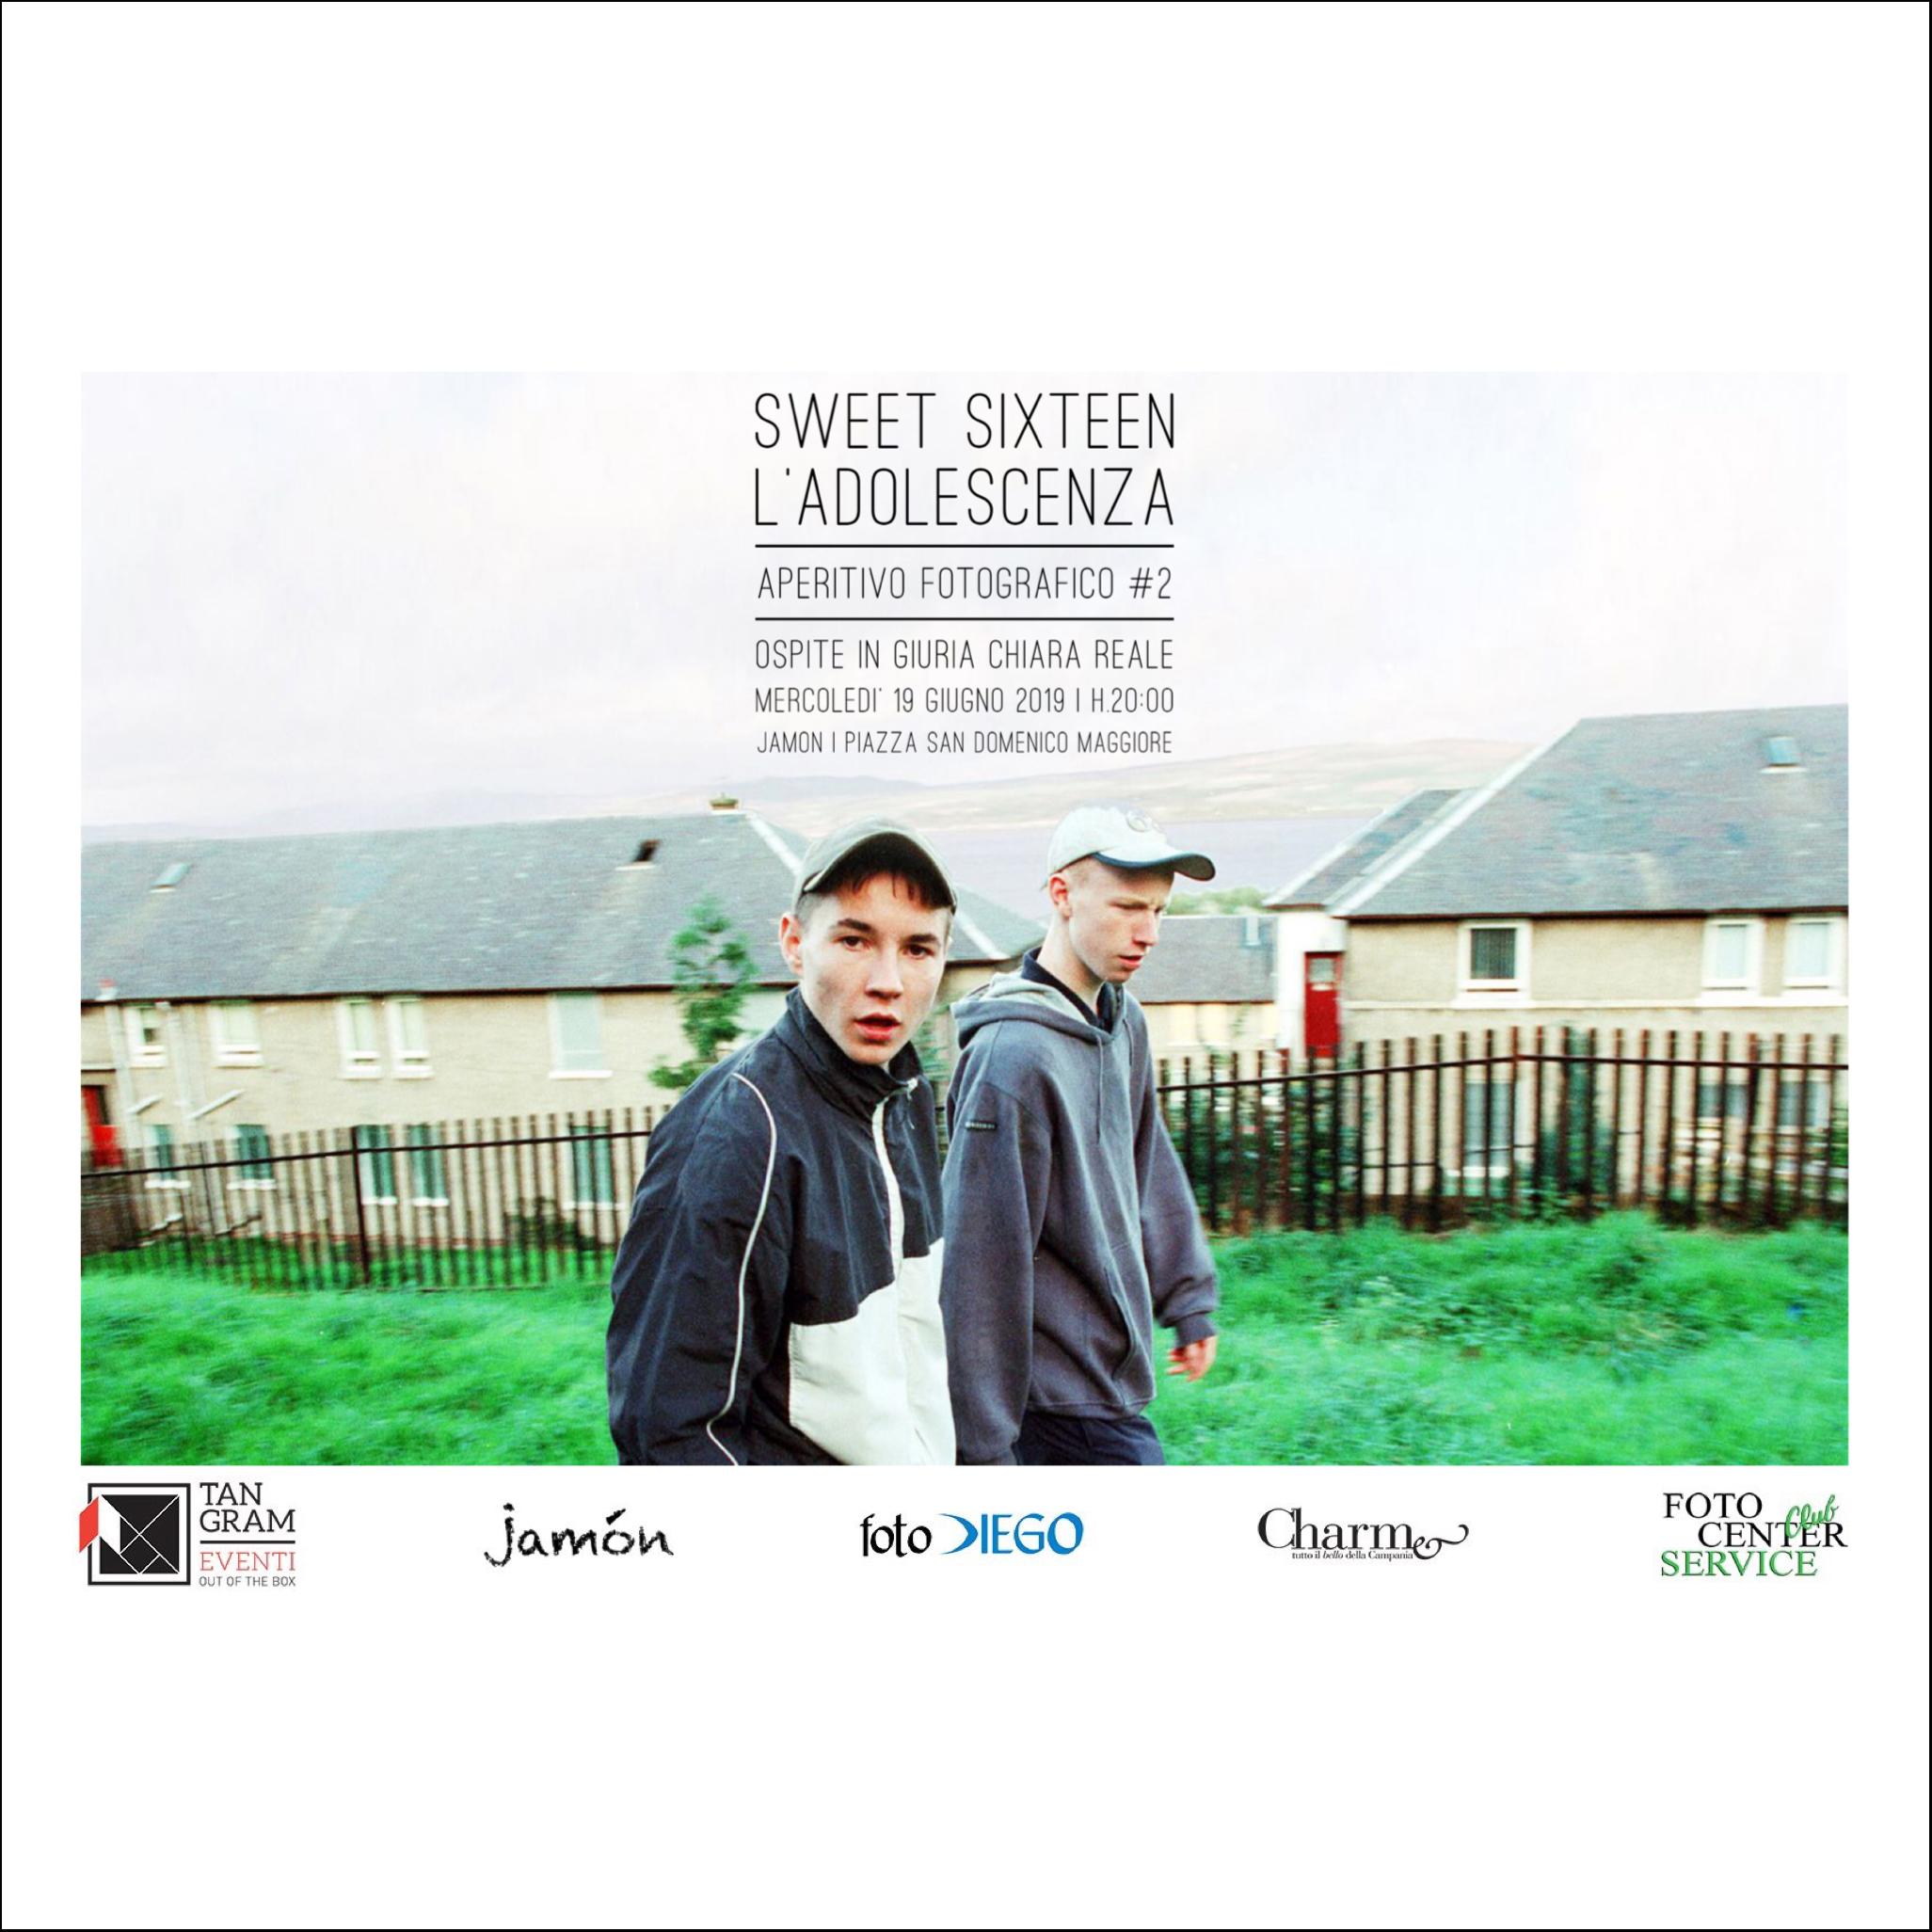 Say Cheese #2| aperitivo fotografico | Sweet Sixteen - l'adolescenza